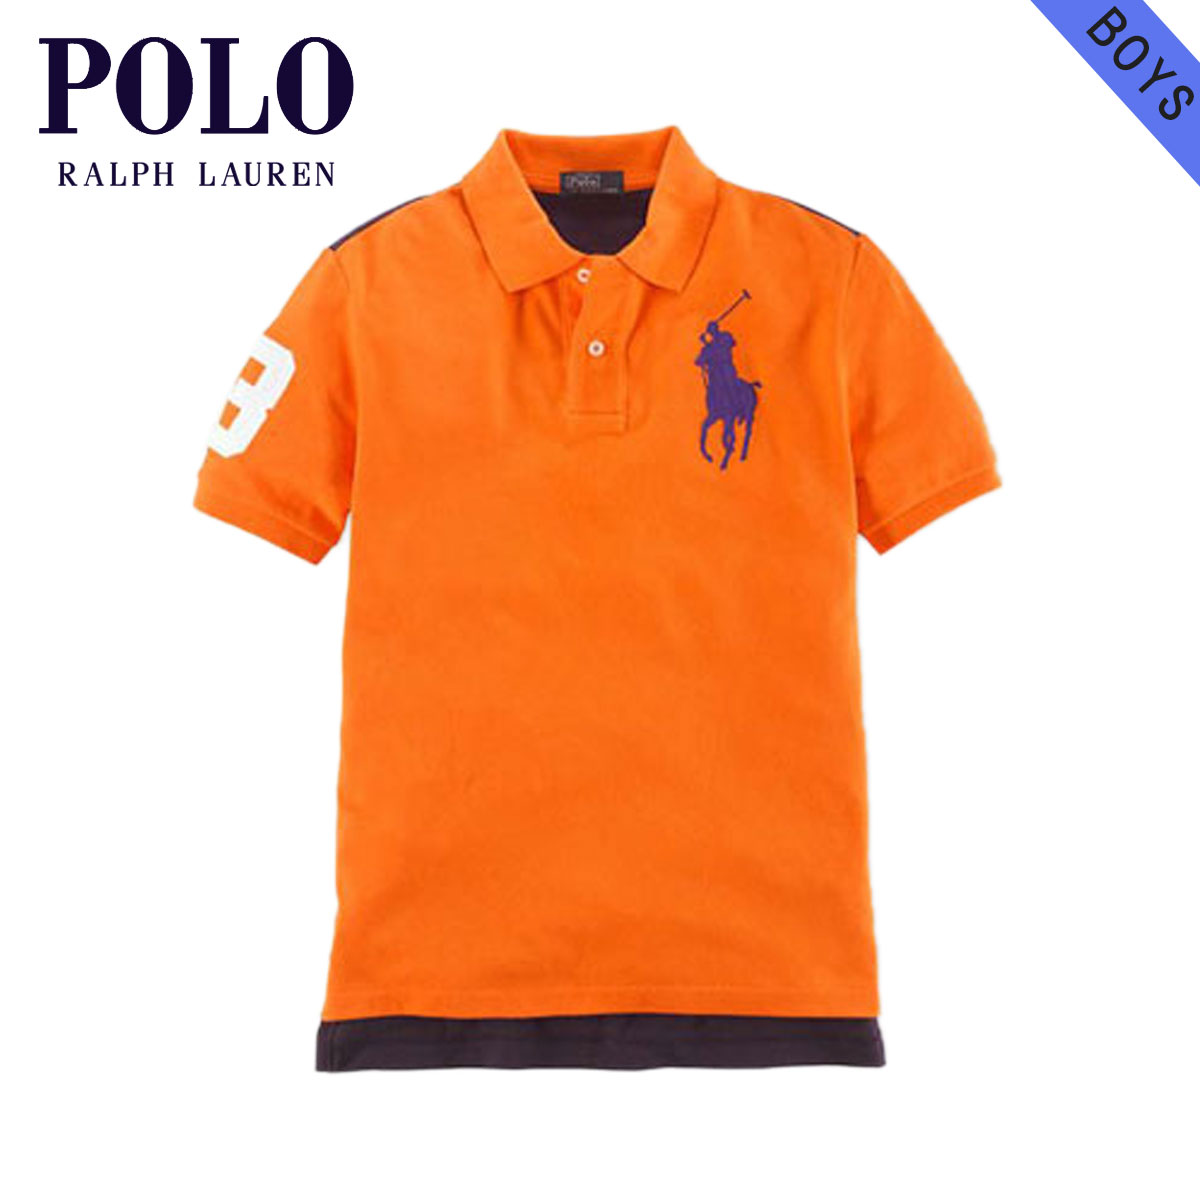 491d587a9d3e Poloralflorenkids POLO RALPH LAUREN CHILDREN genuine kids clothing boys Polo  Shirt Big Pony Mesh Polo  18121236 ORANGE 10P22Jul14